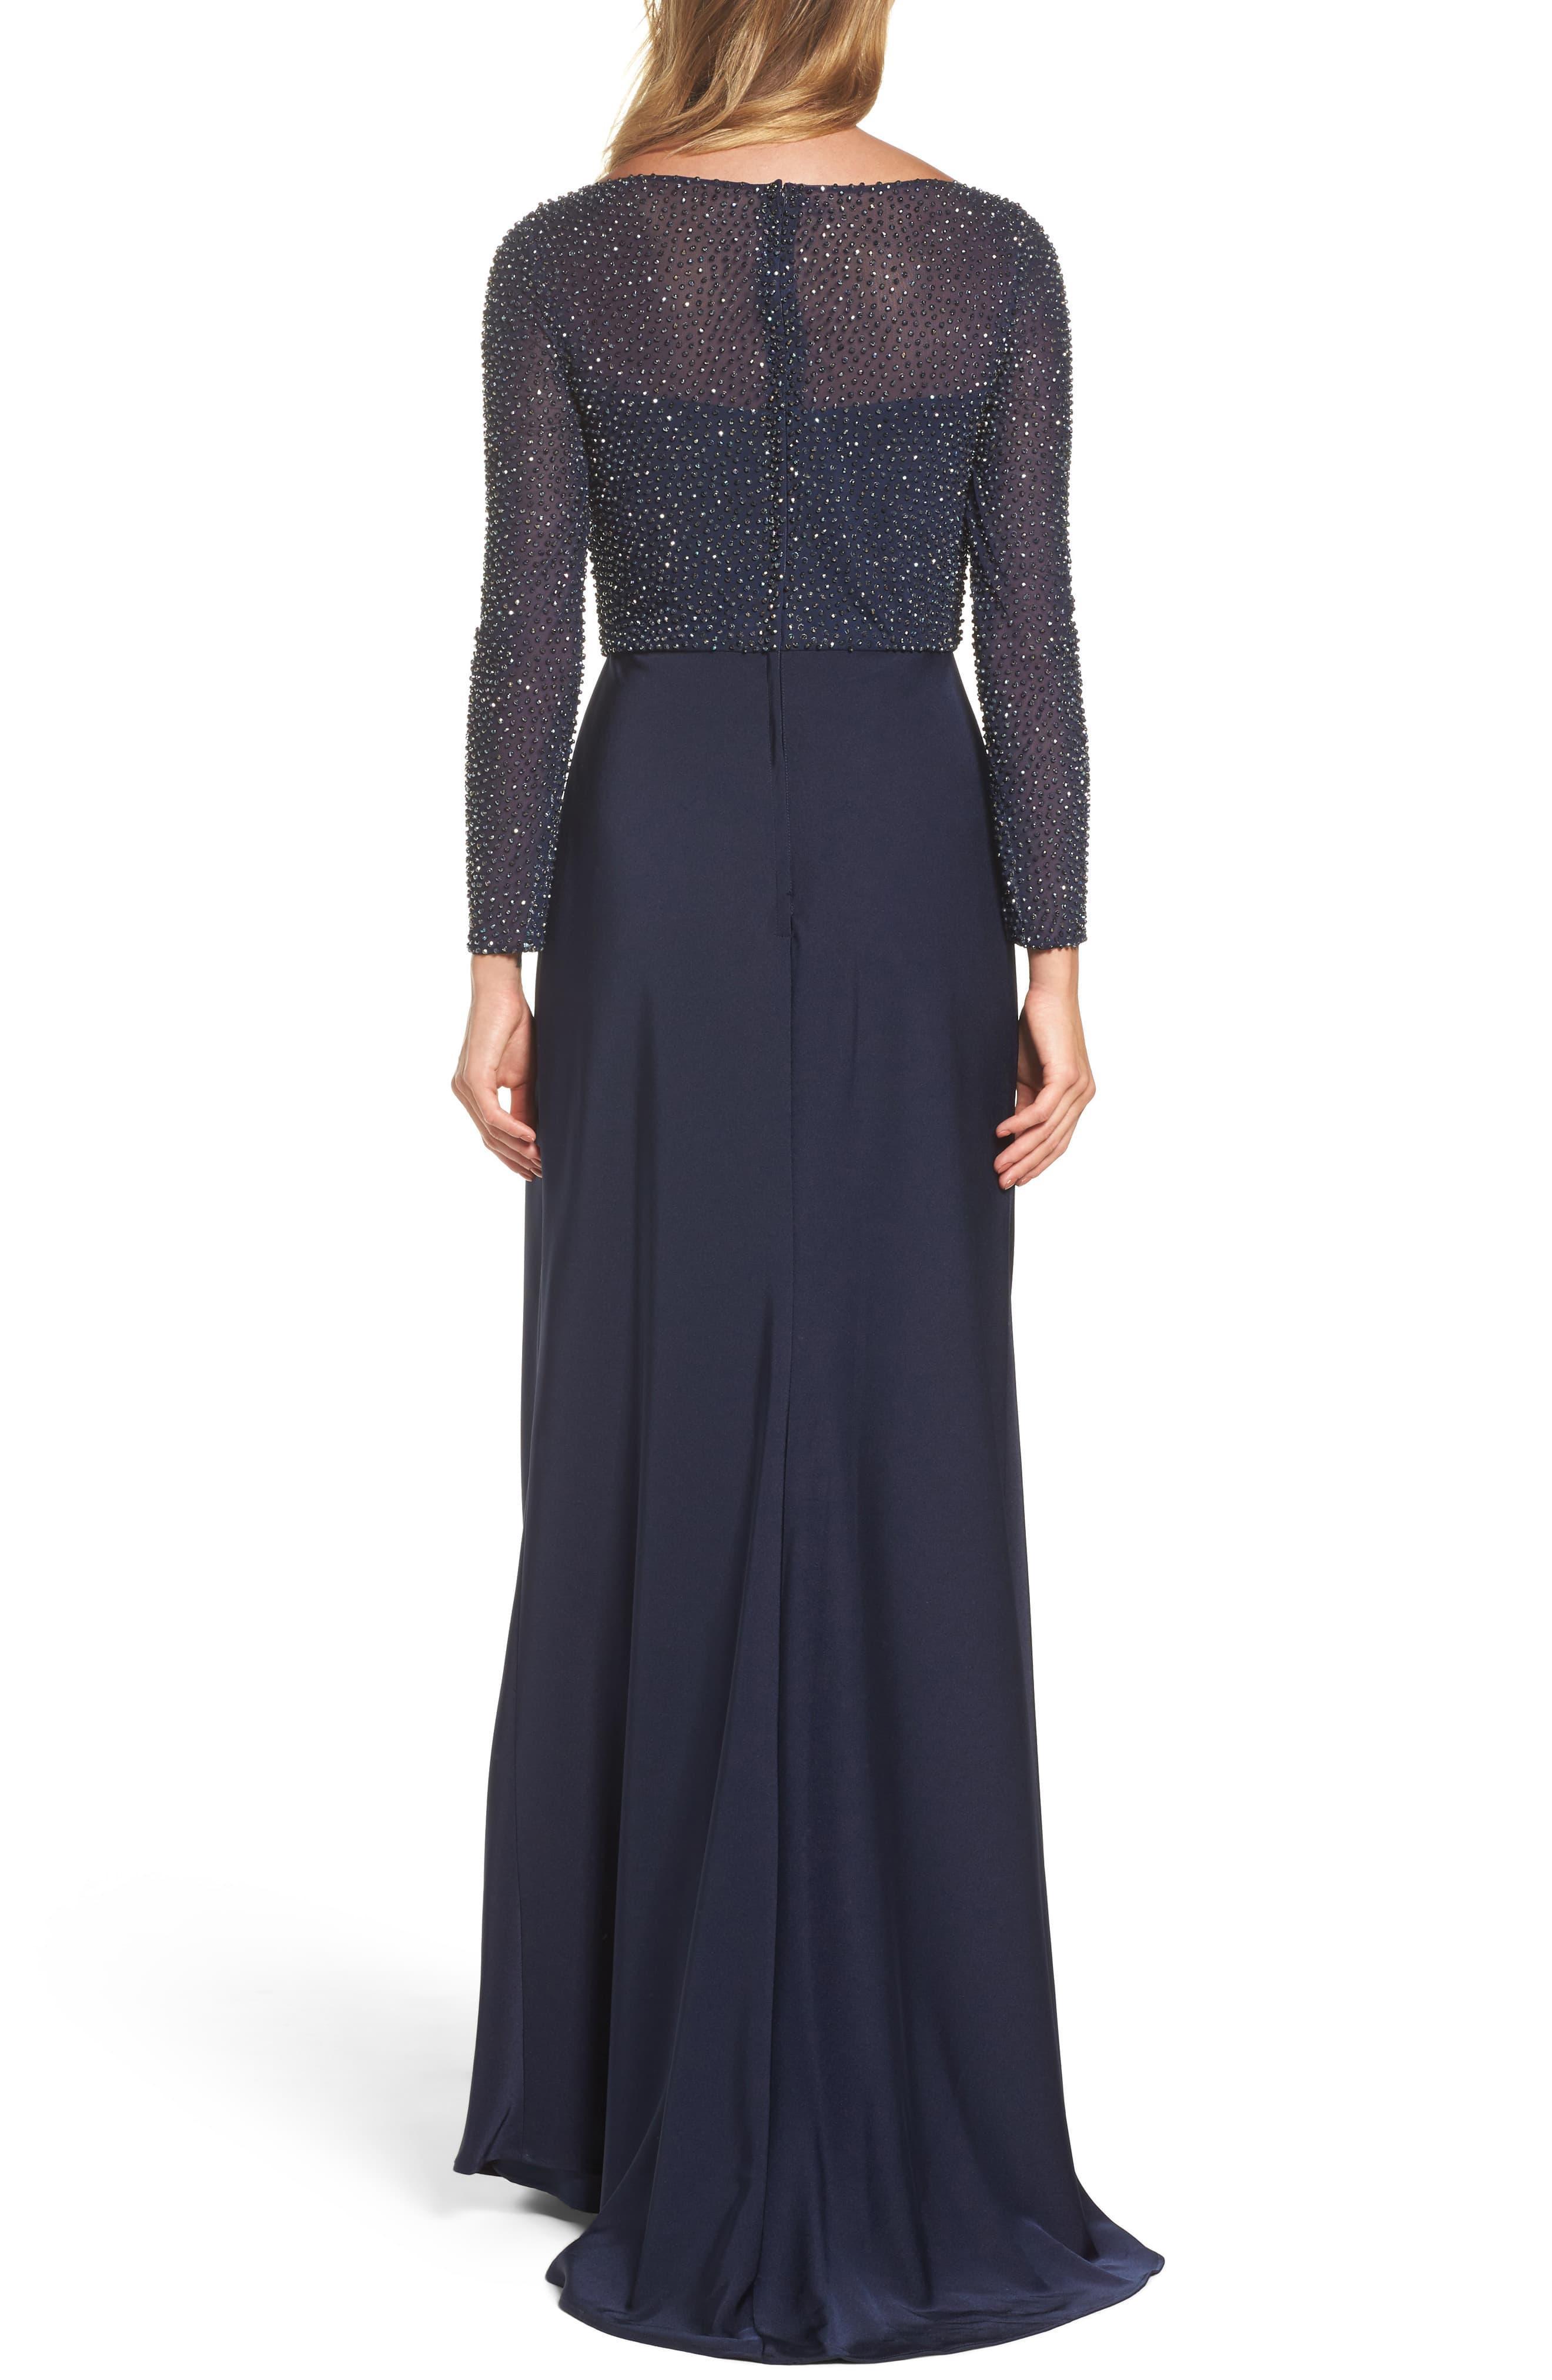 7429132ed41 La Femme - Blue Bead Embellished Gown - Lyst. View fullscreen